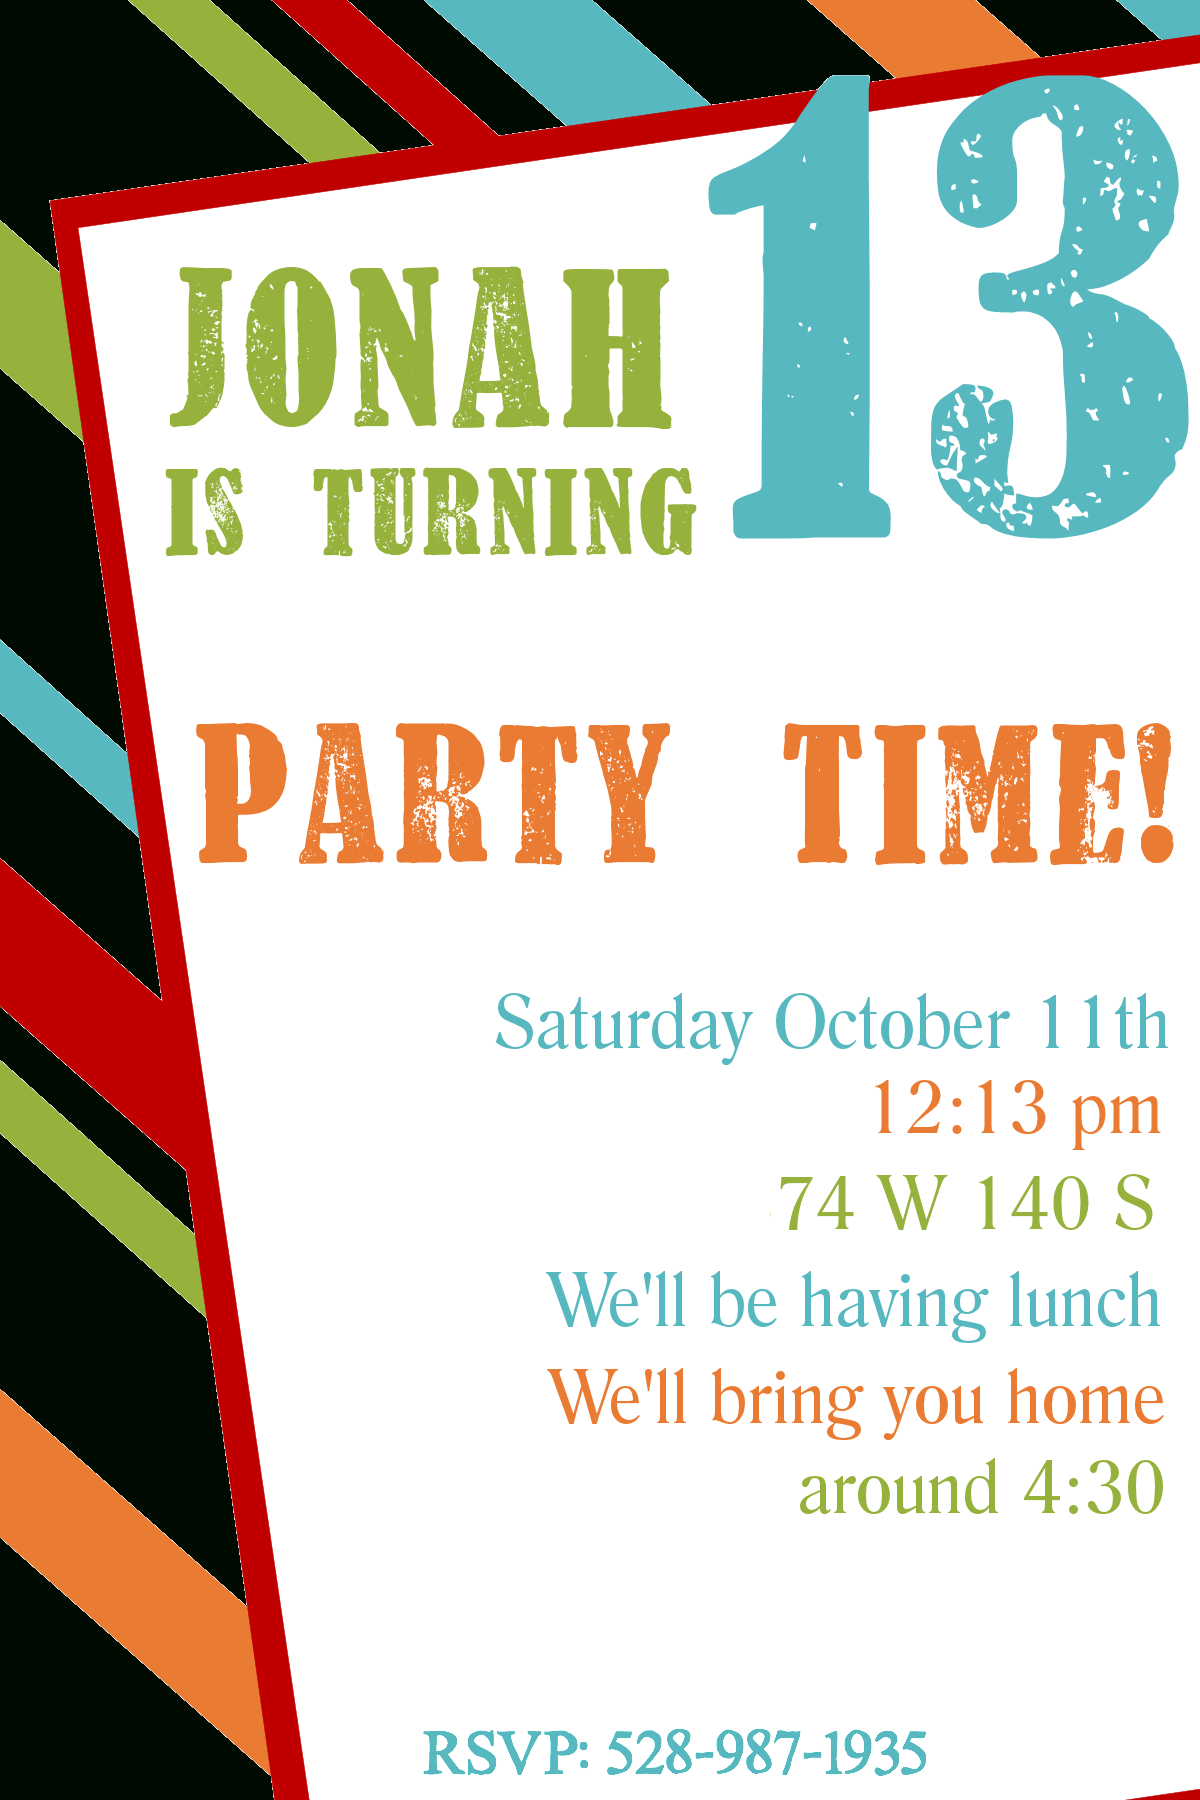 Boy Birthday Invitation Templates Free - Tutlin.psstech.co - Free Printable Boy Birthday Invitations